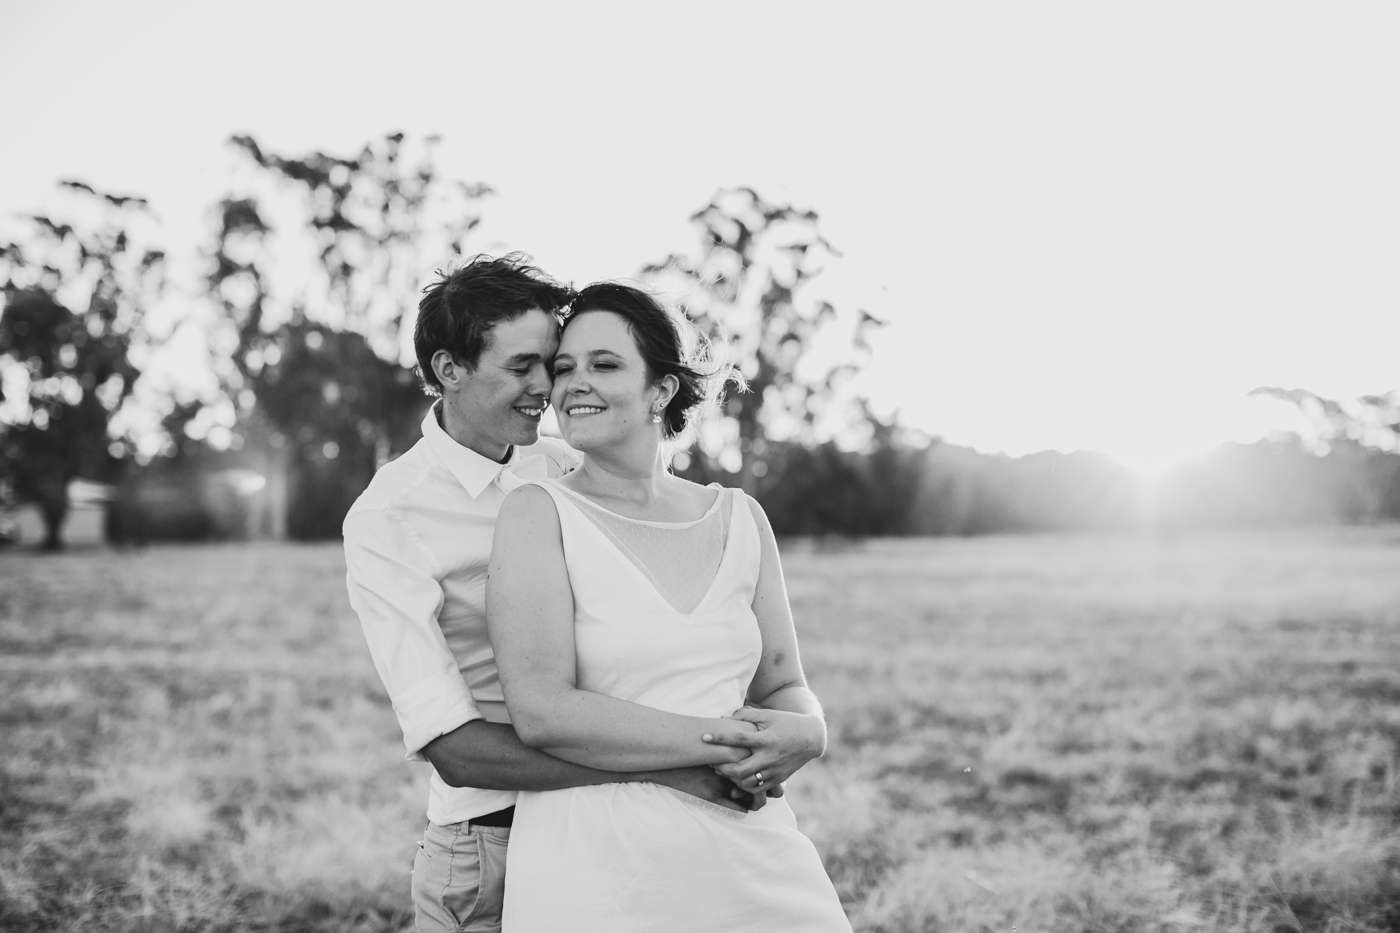 Nicolle & Jacob - Dubbo Wedding - Country Australia - Samantha Heather Photography-252.jpg